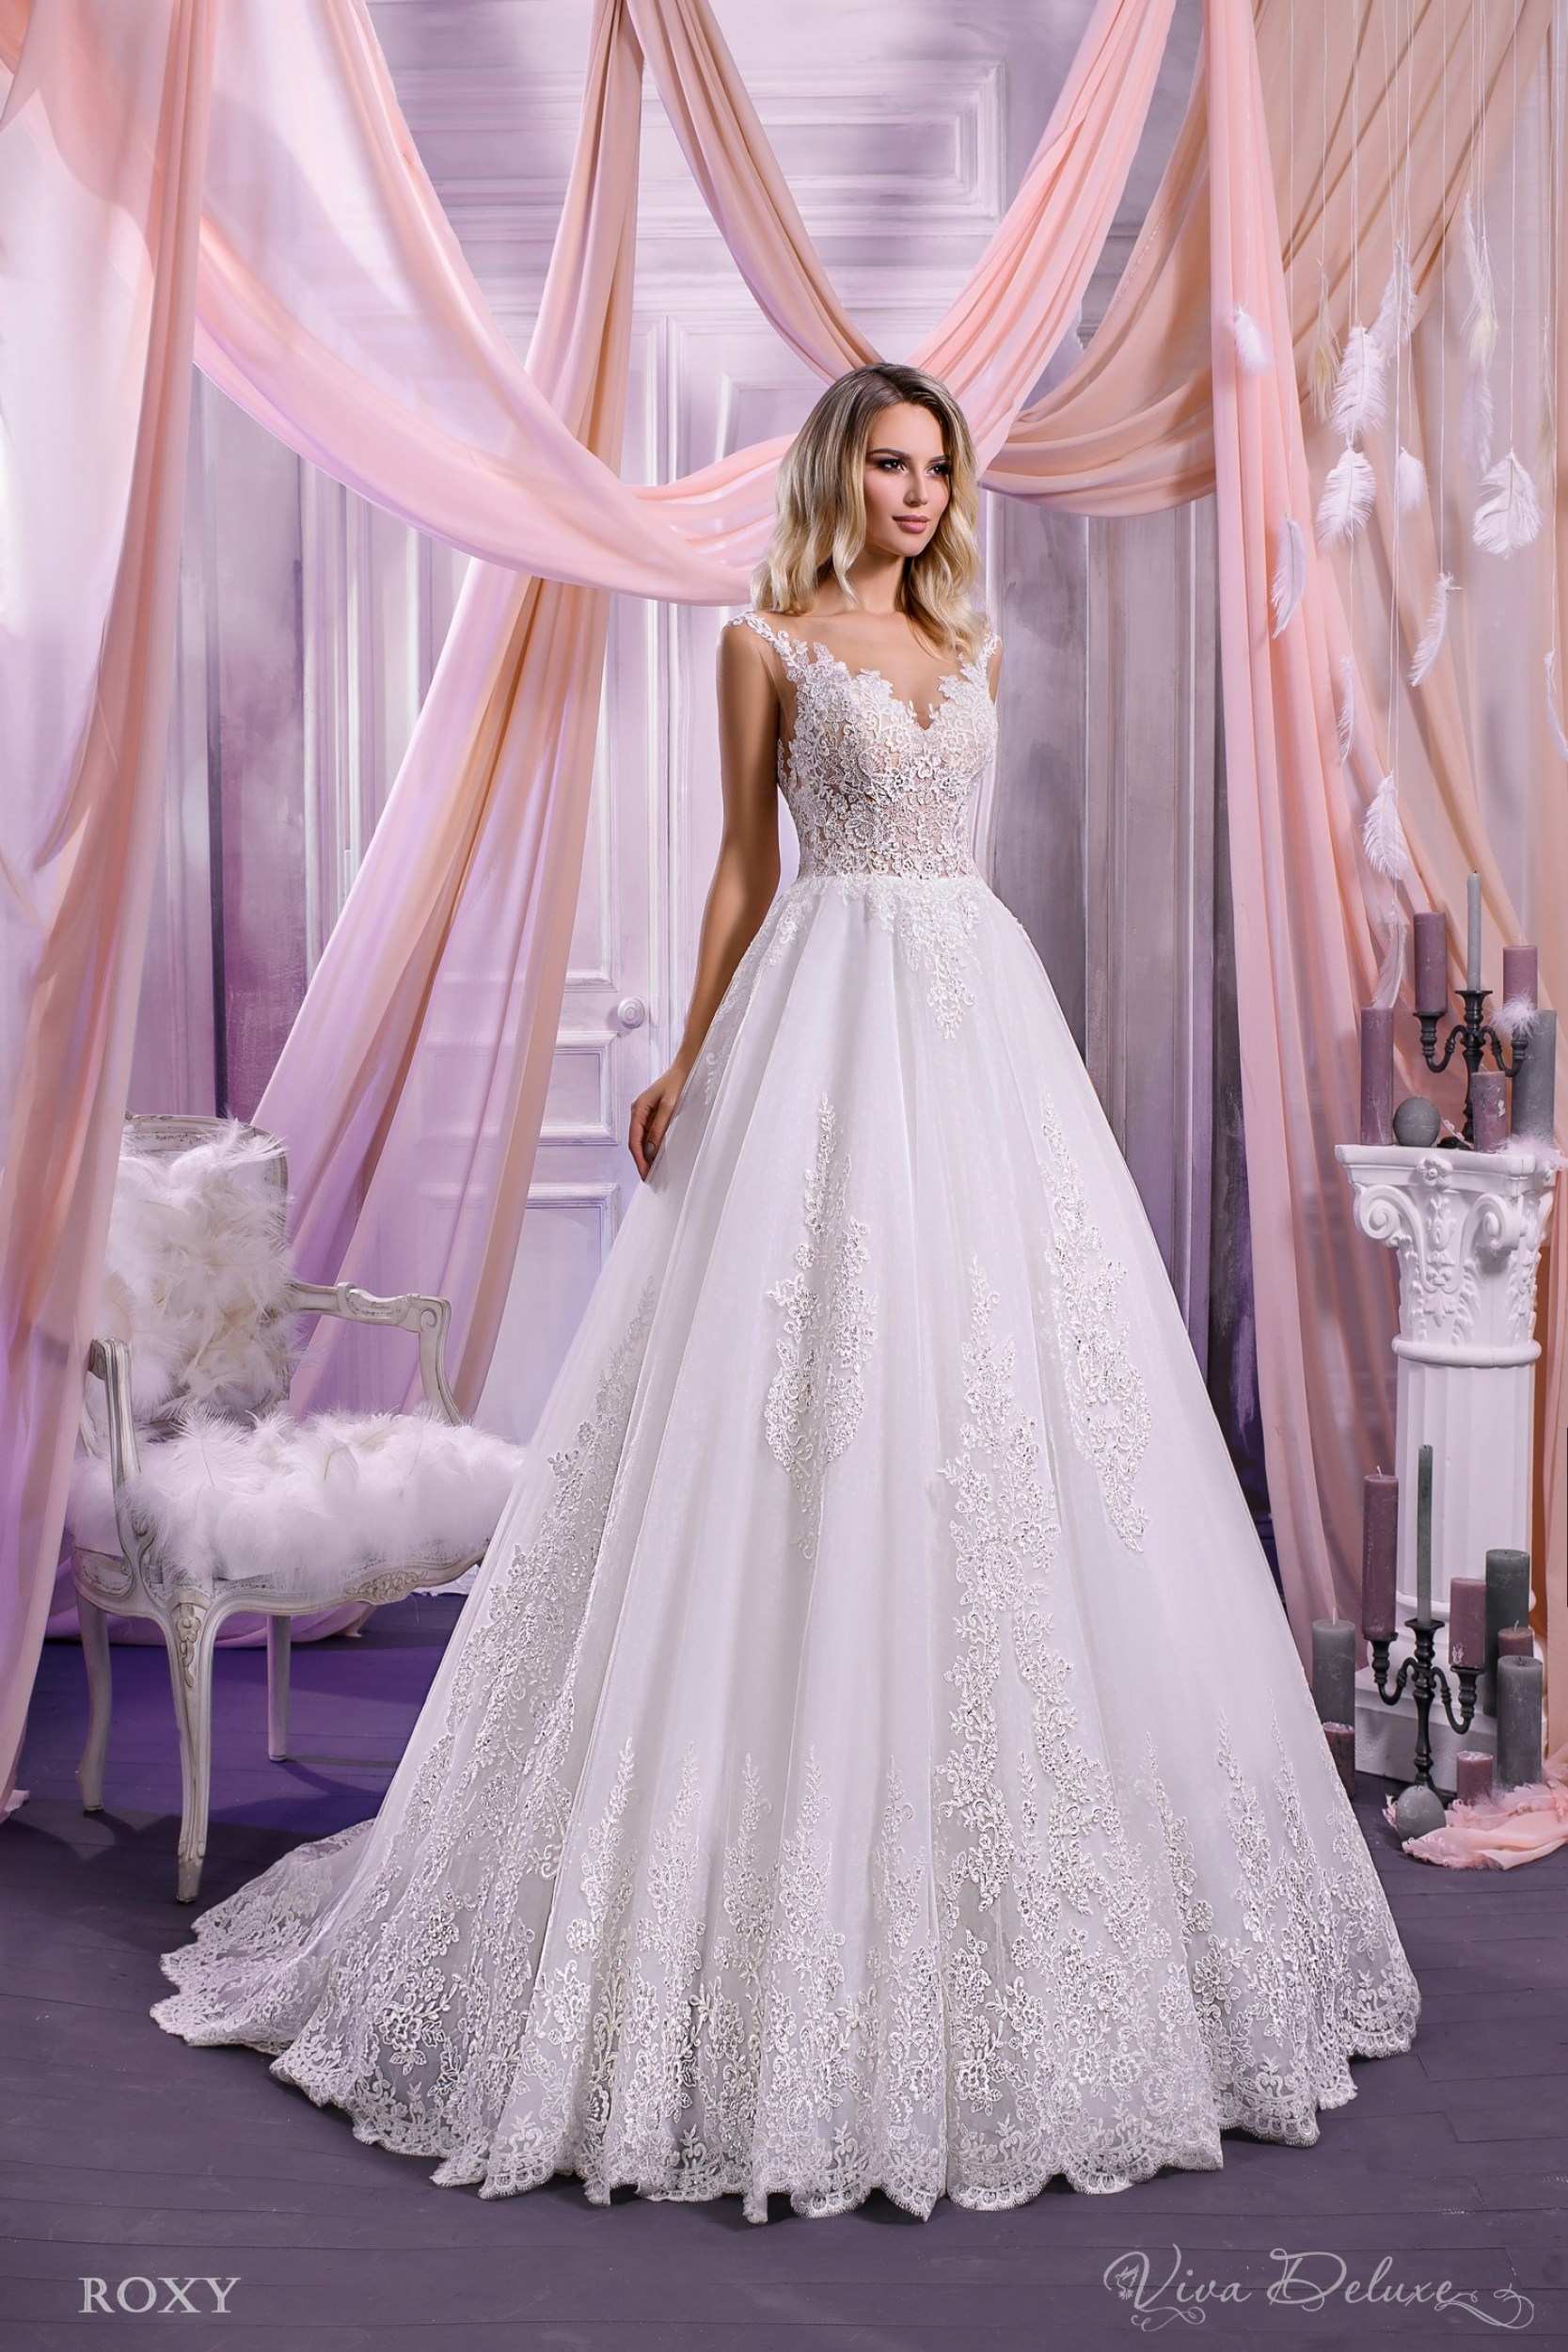 VivaDeluxe — ukrainian wedding dresses